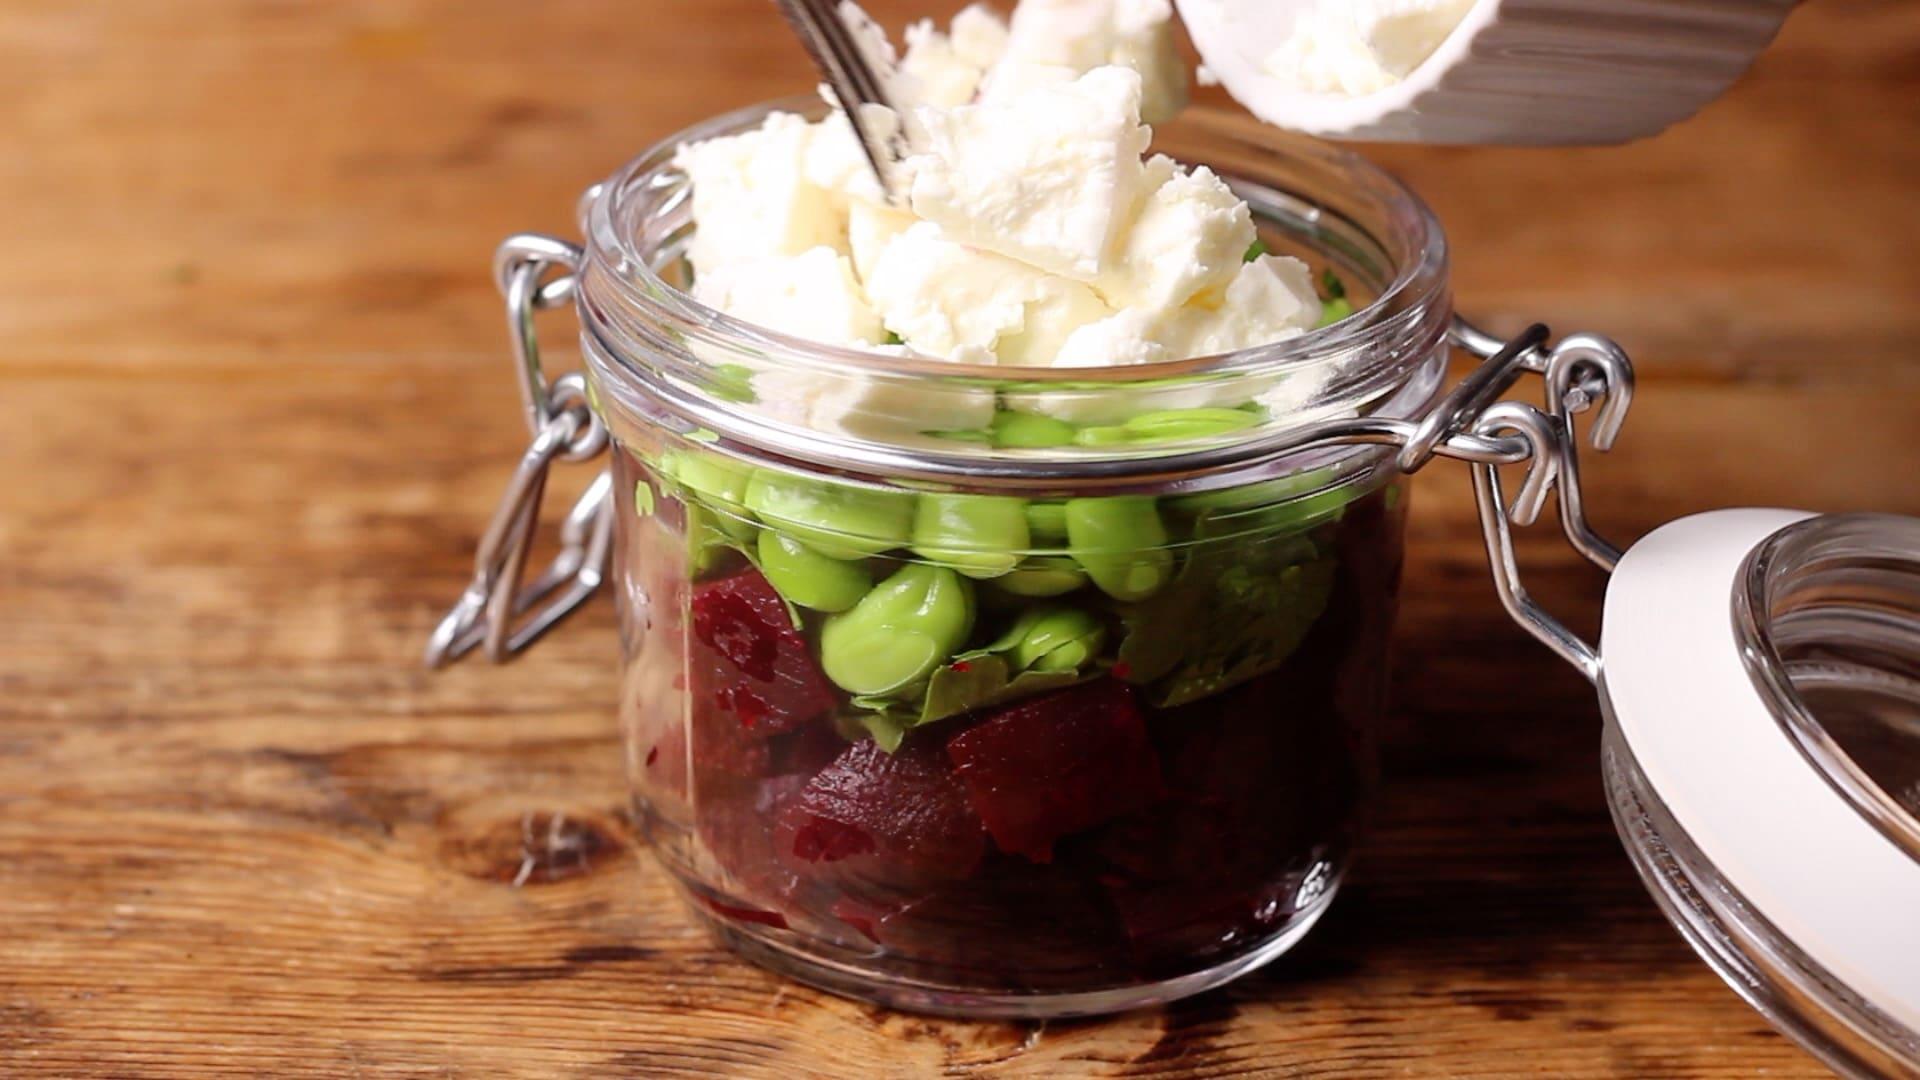 beetroot salad with feta